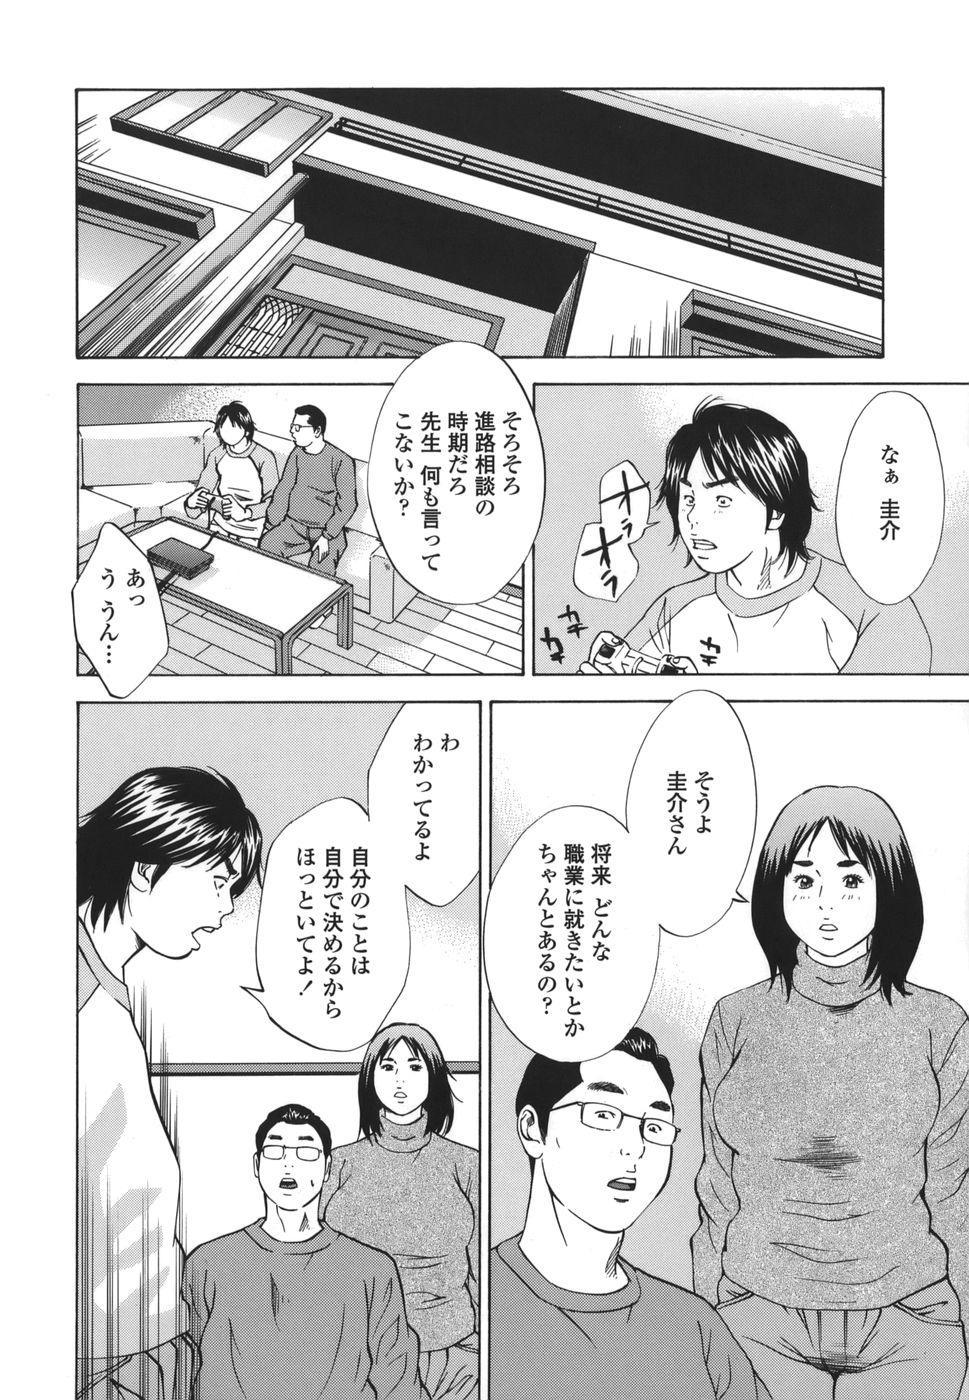 Kinshin Goukan - Near Relation Rapes 169